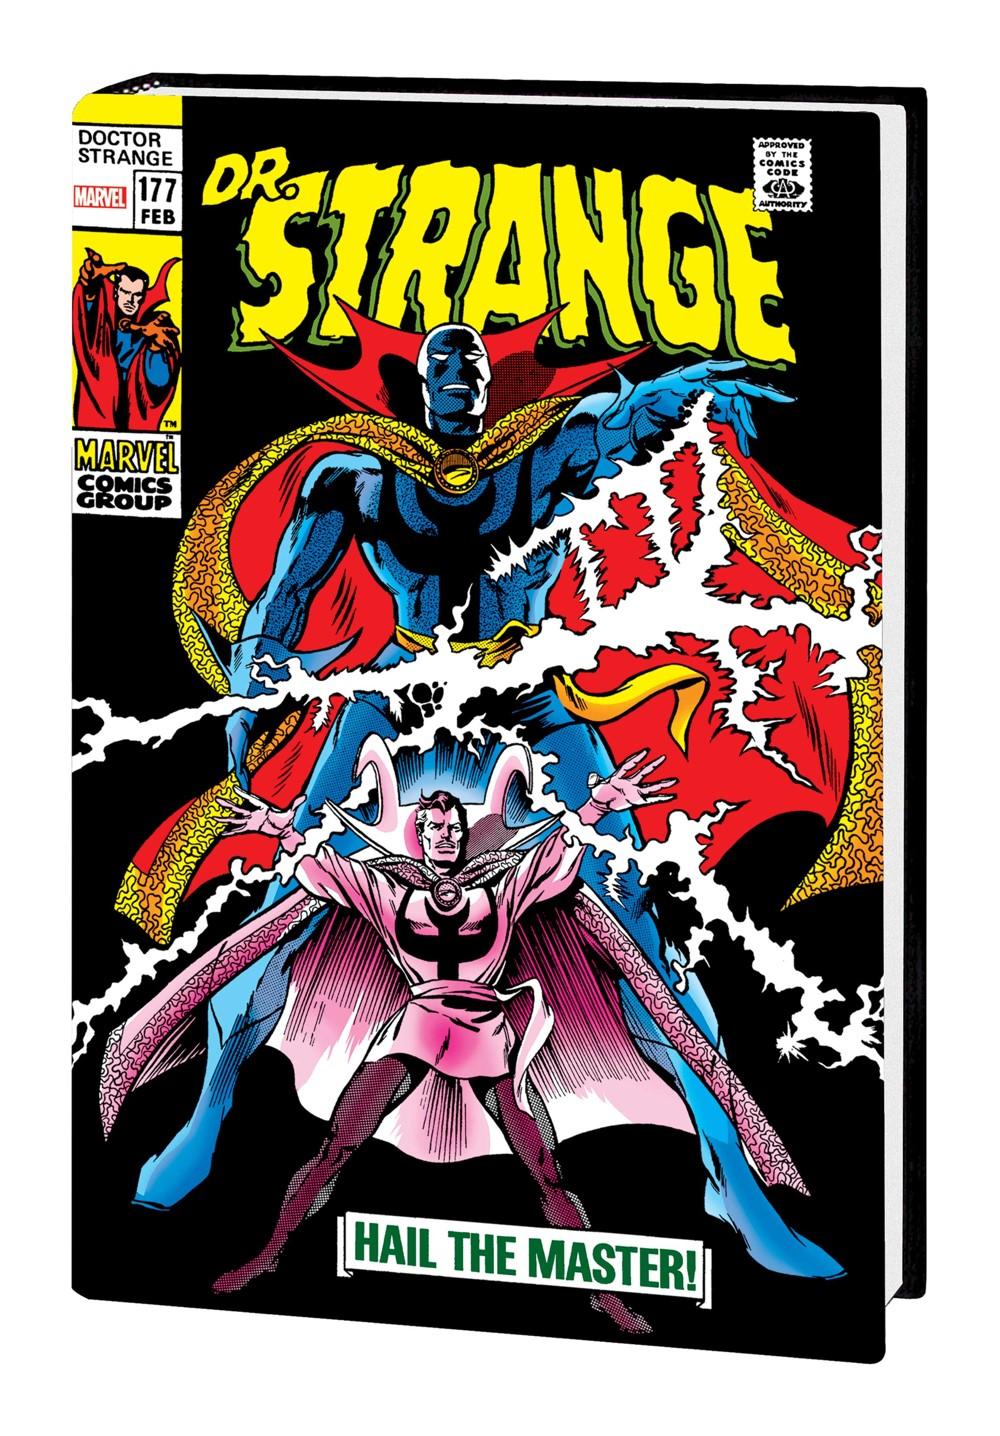 DRSTRANGE_OMNI_V2_HC_COLAN Marvel Comics September 2021 Solicitations